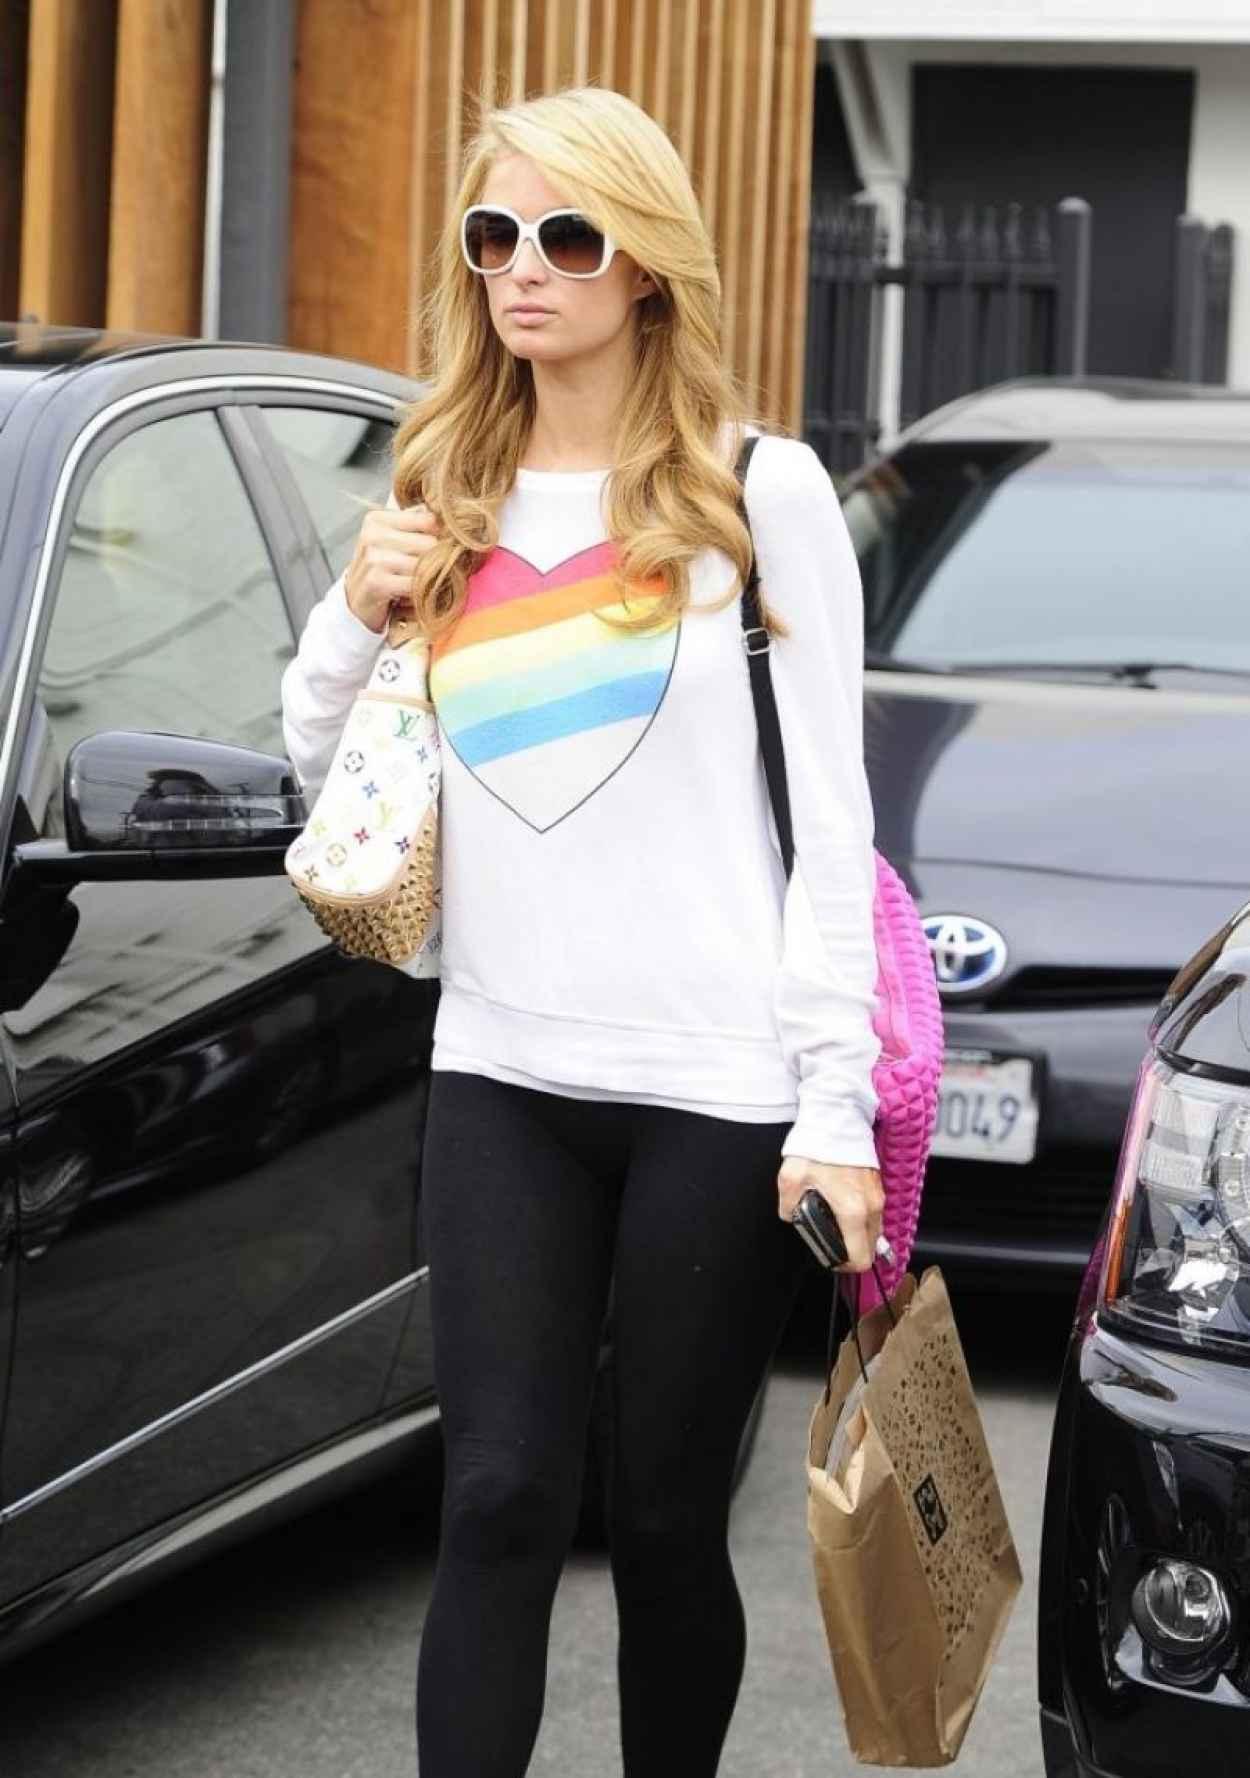 Paris Hilton - Leaving a Hair Salon - Beverly Hills, January 2015-1